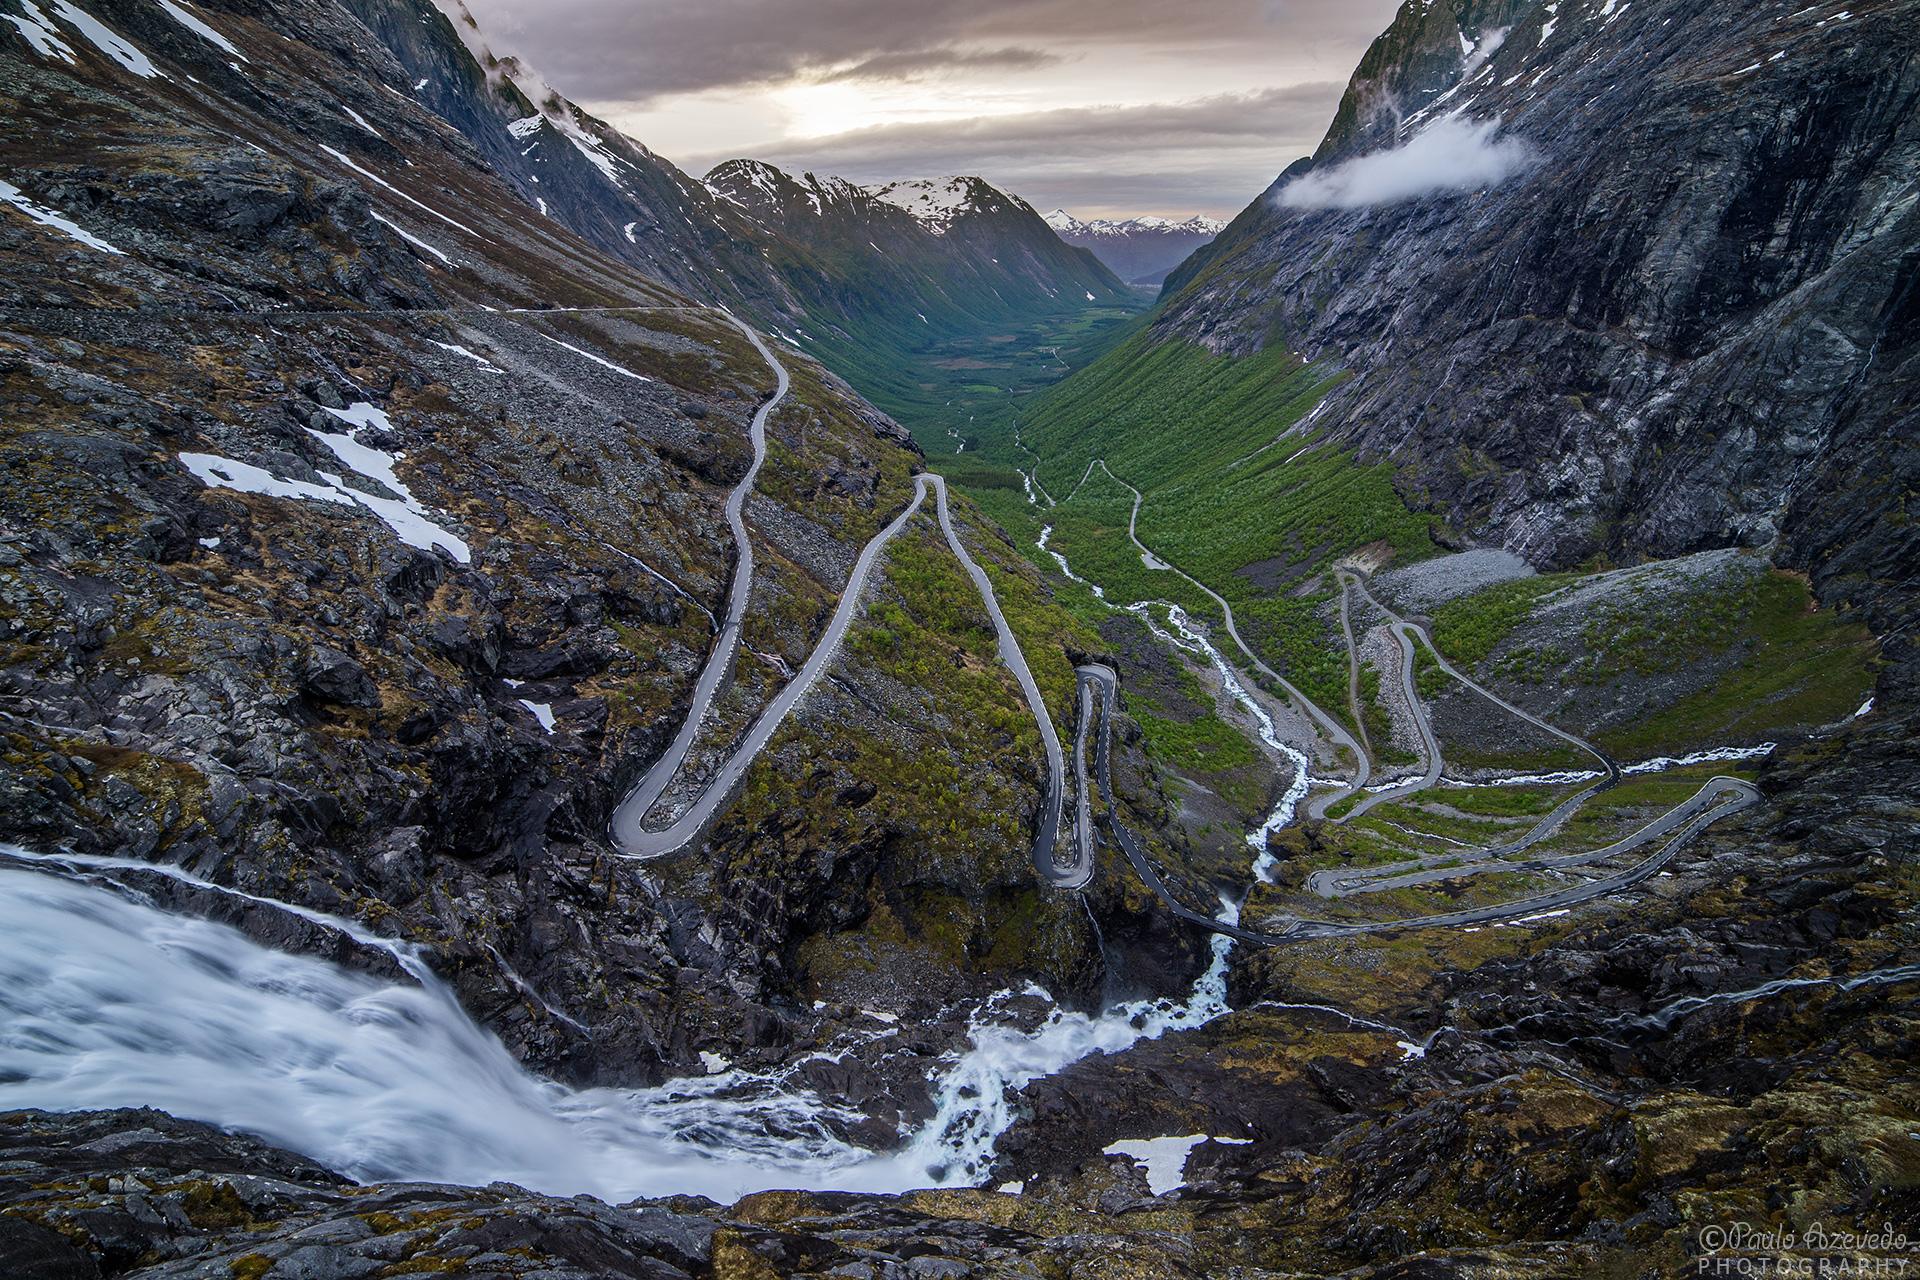 The Trolls Path, Norway